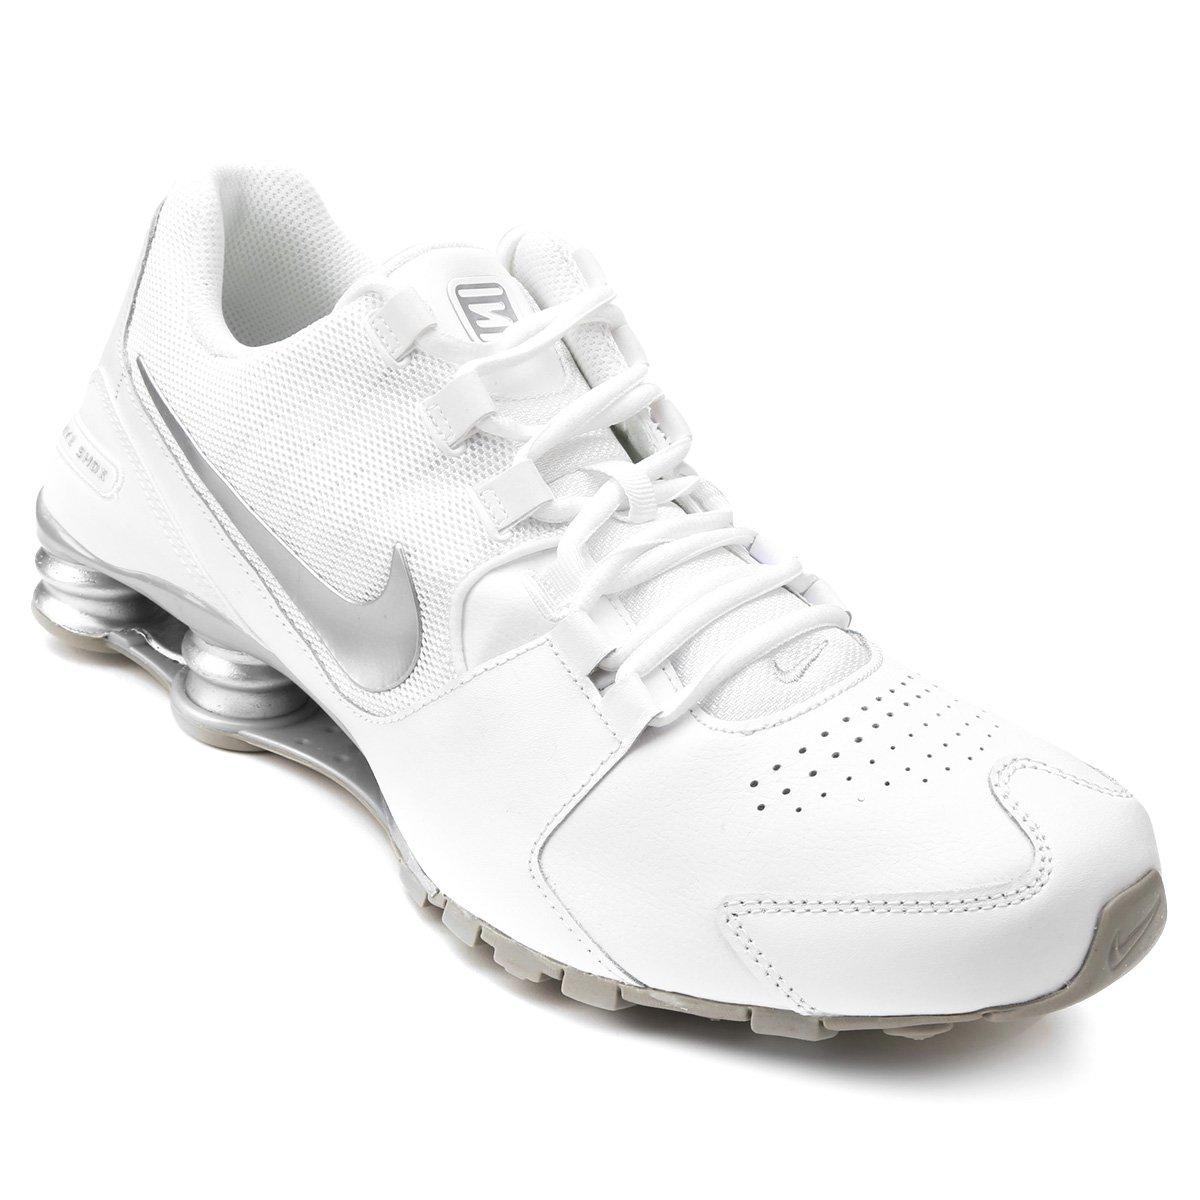 Tênis Couro Nike Shox Avenue LTR Masculino - Compre Agora  c2c65d0df8cd7